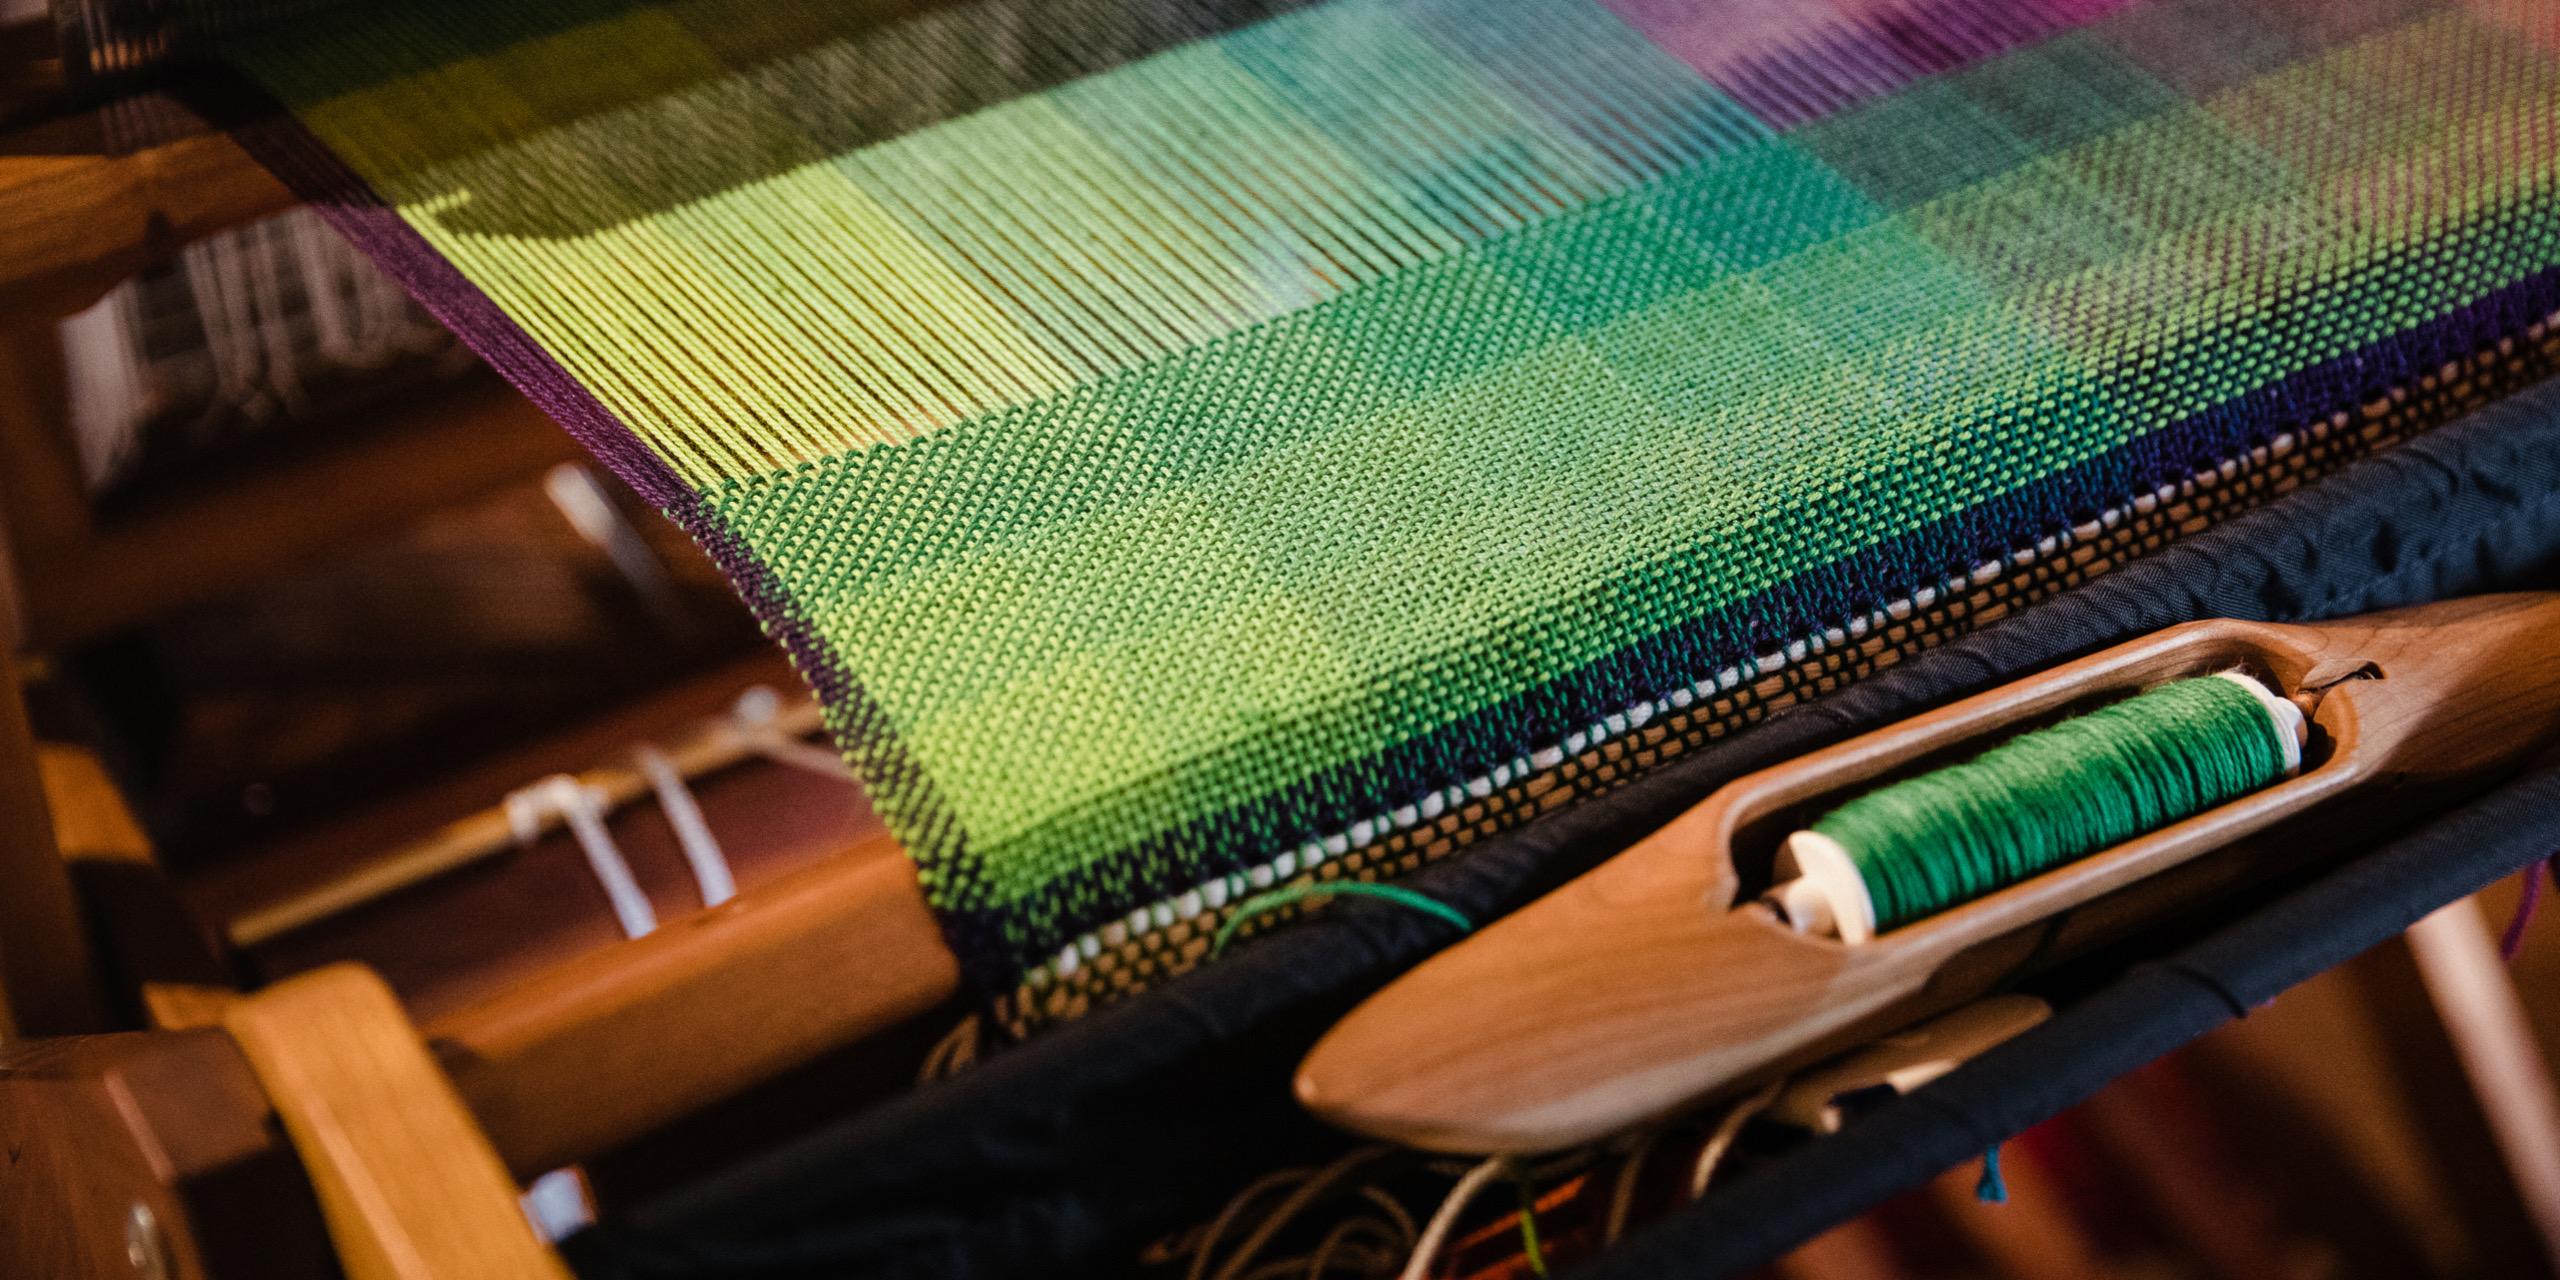 Handwoven colour gamp shawl using SweetGeorgia yarns